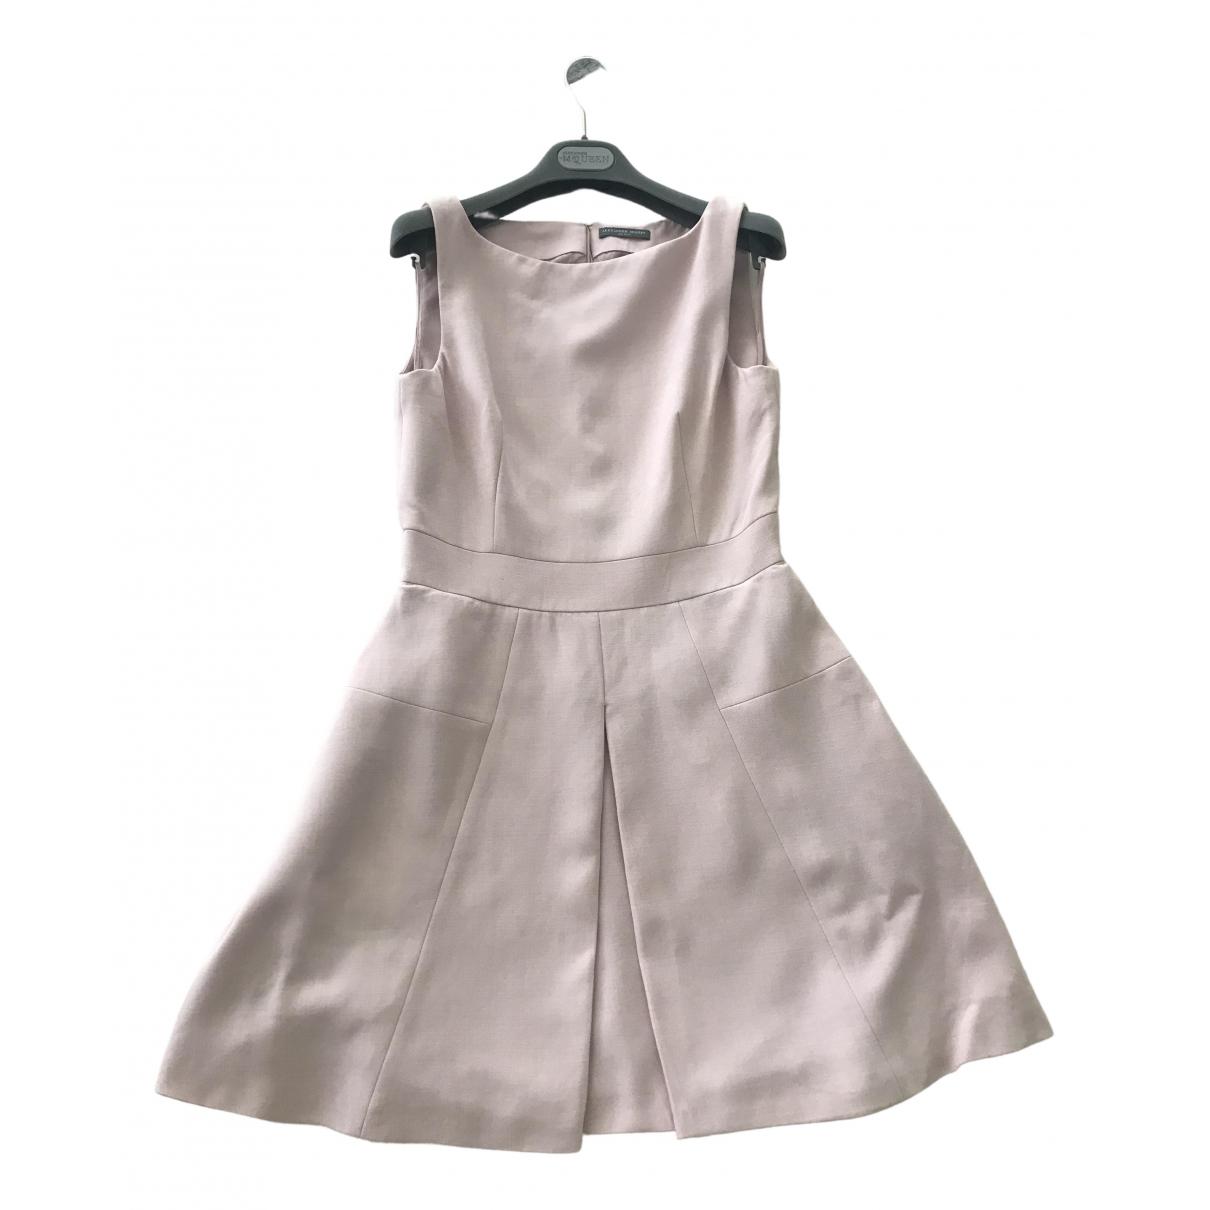 Alexander Mcqueen \N Pink dress for Women 42 IT